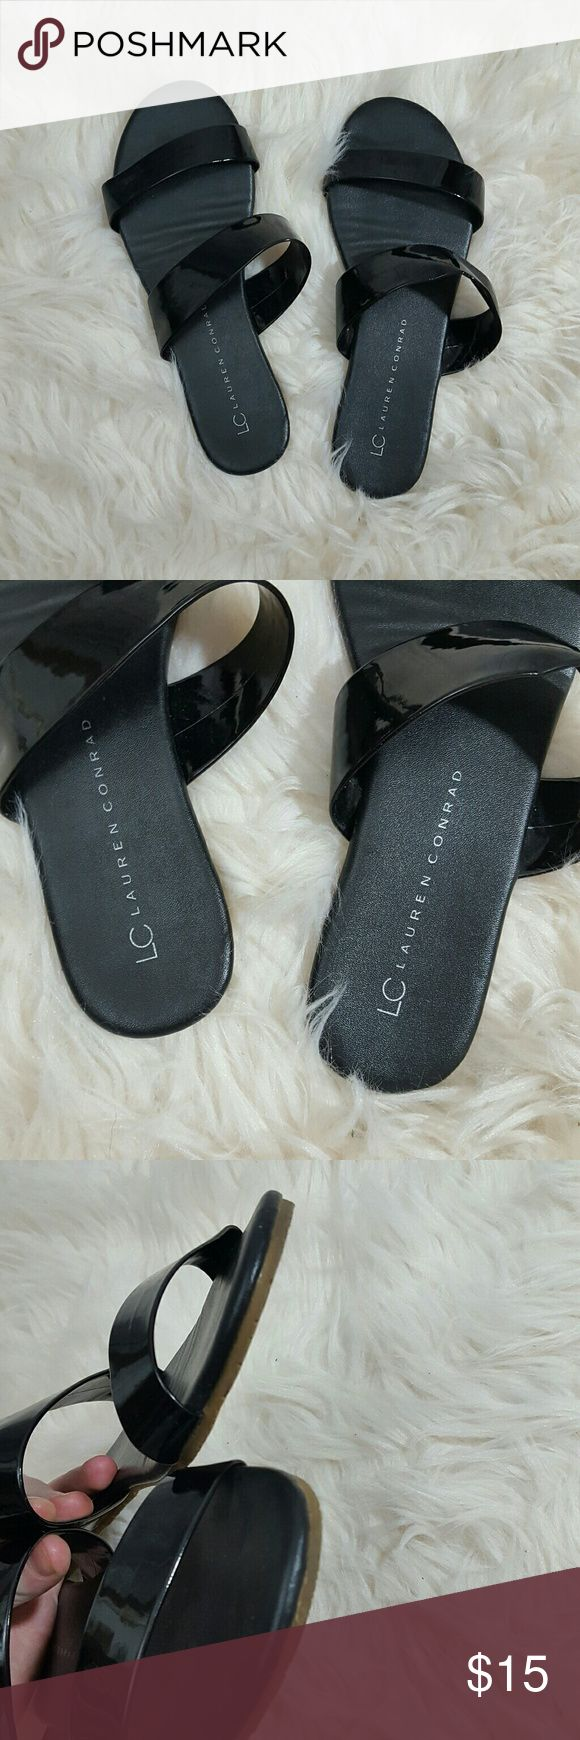 Lauren Conrad Black Open Toe Sandals Spring Summer Preloved; in overall great condition! Minor scuffs on toe bed. Lauren Conrad  Shoes Sandals